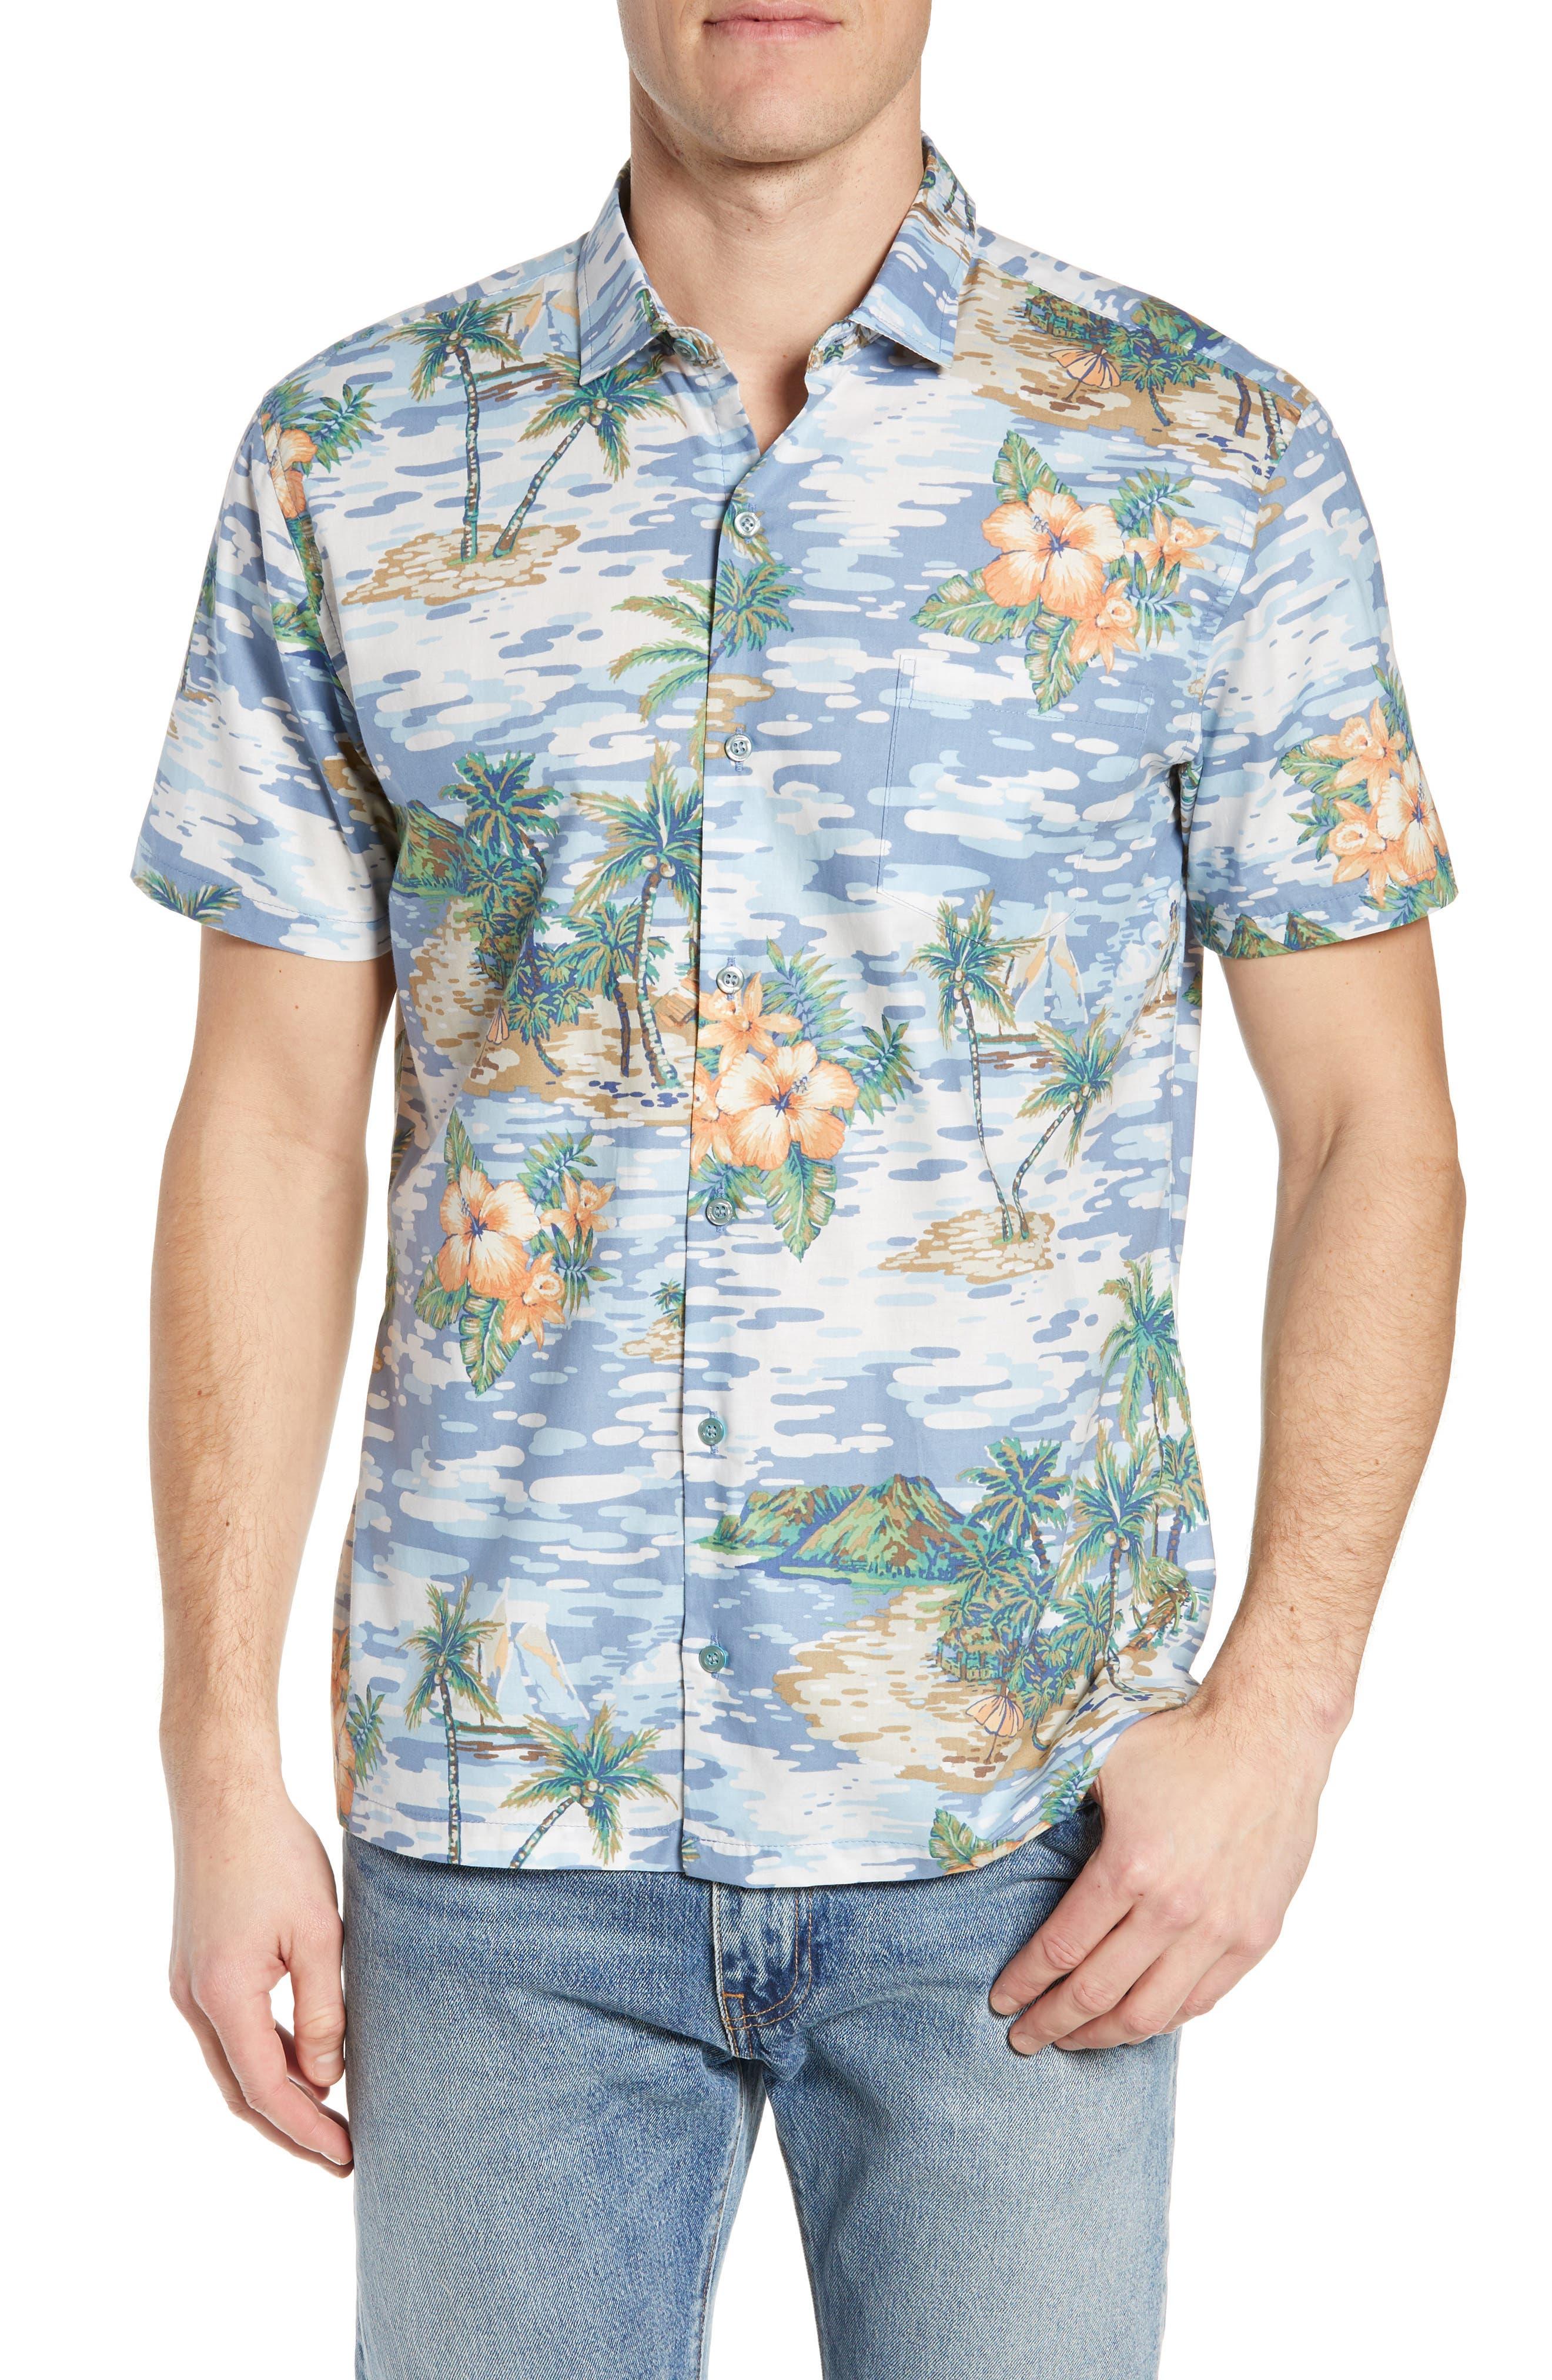 TORI RICHARD, Archipelago Regular Fit Sport Shirt, Main thumbnail 1, color, 061